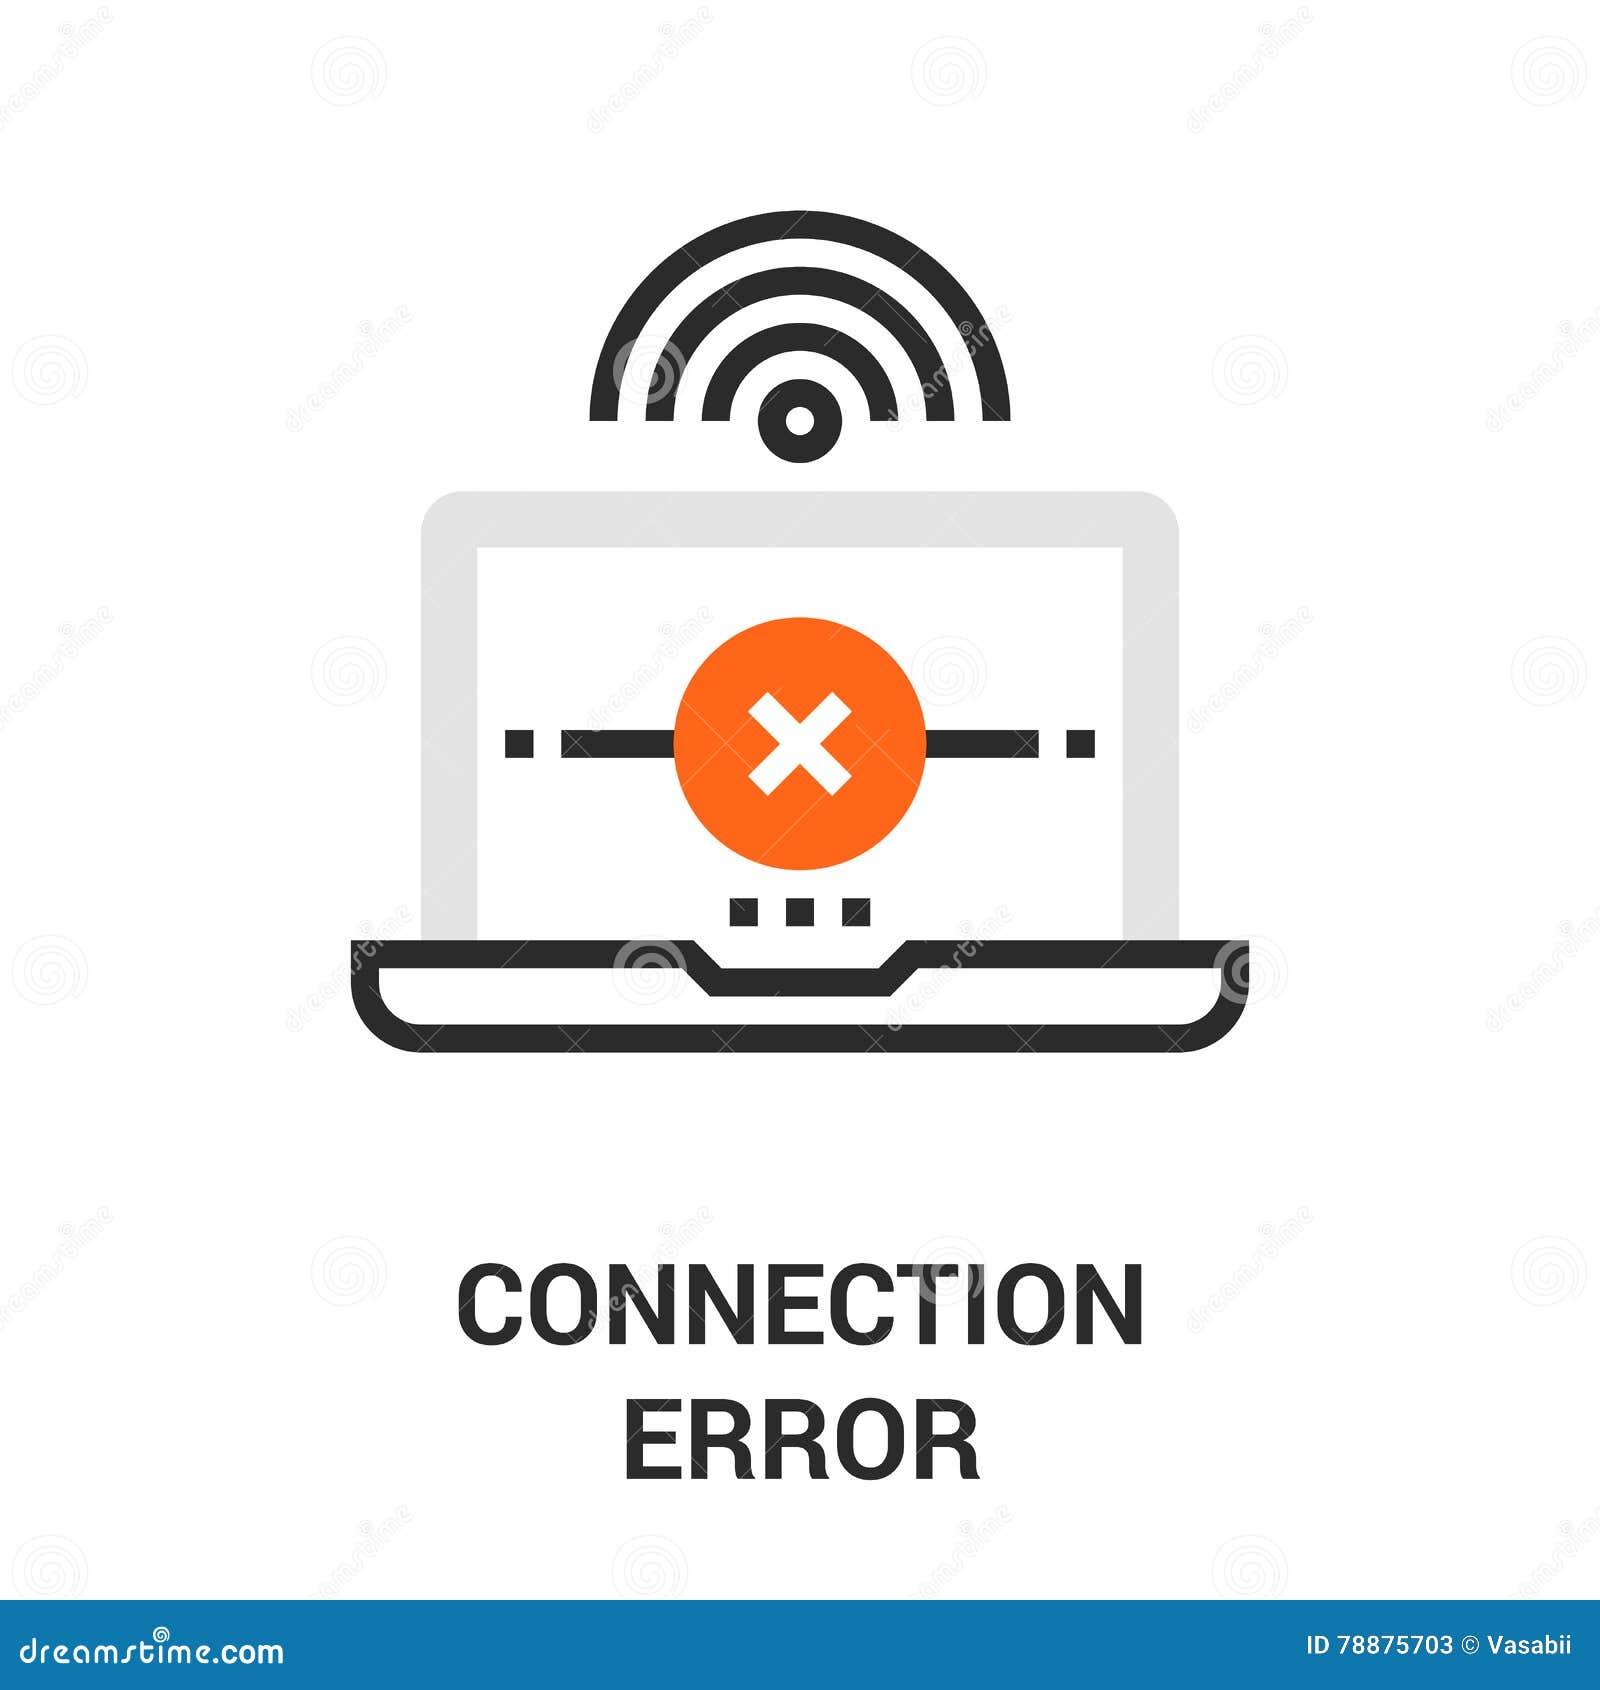 Connection error icon stock vector. Image of fail ...